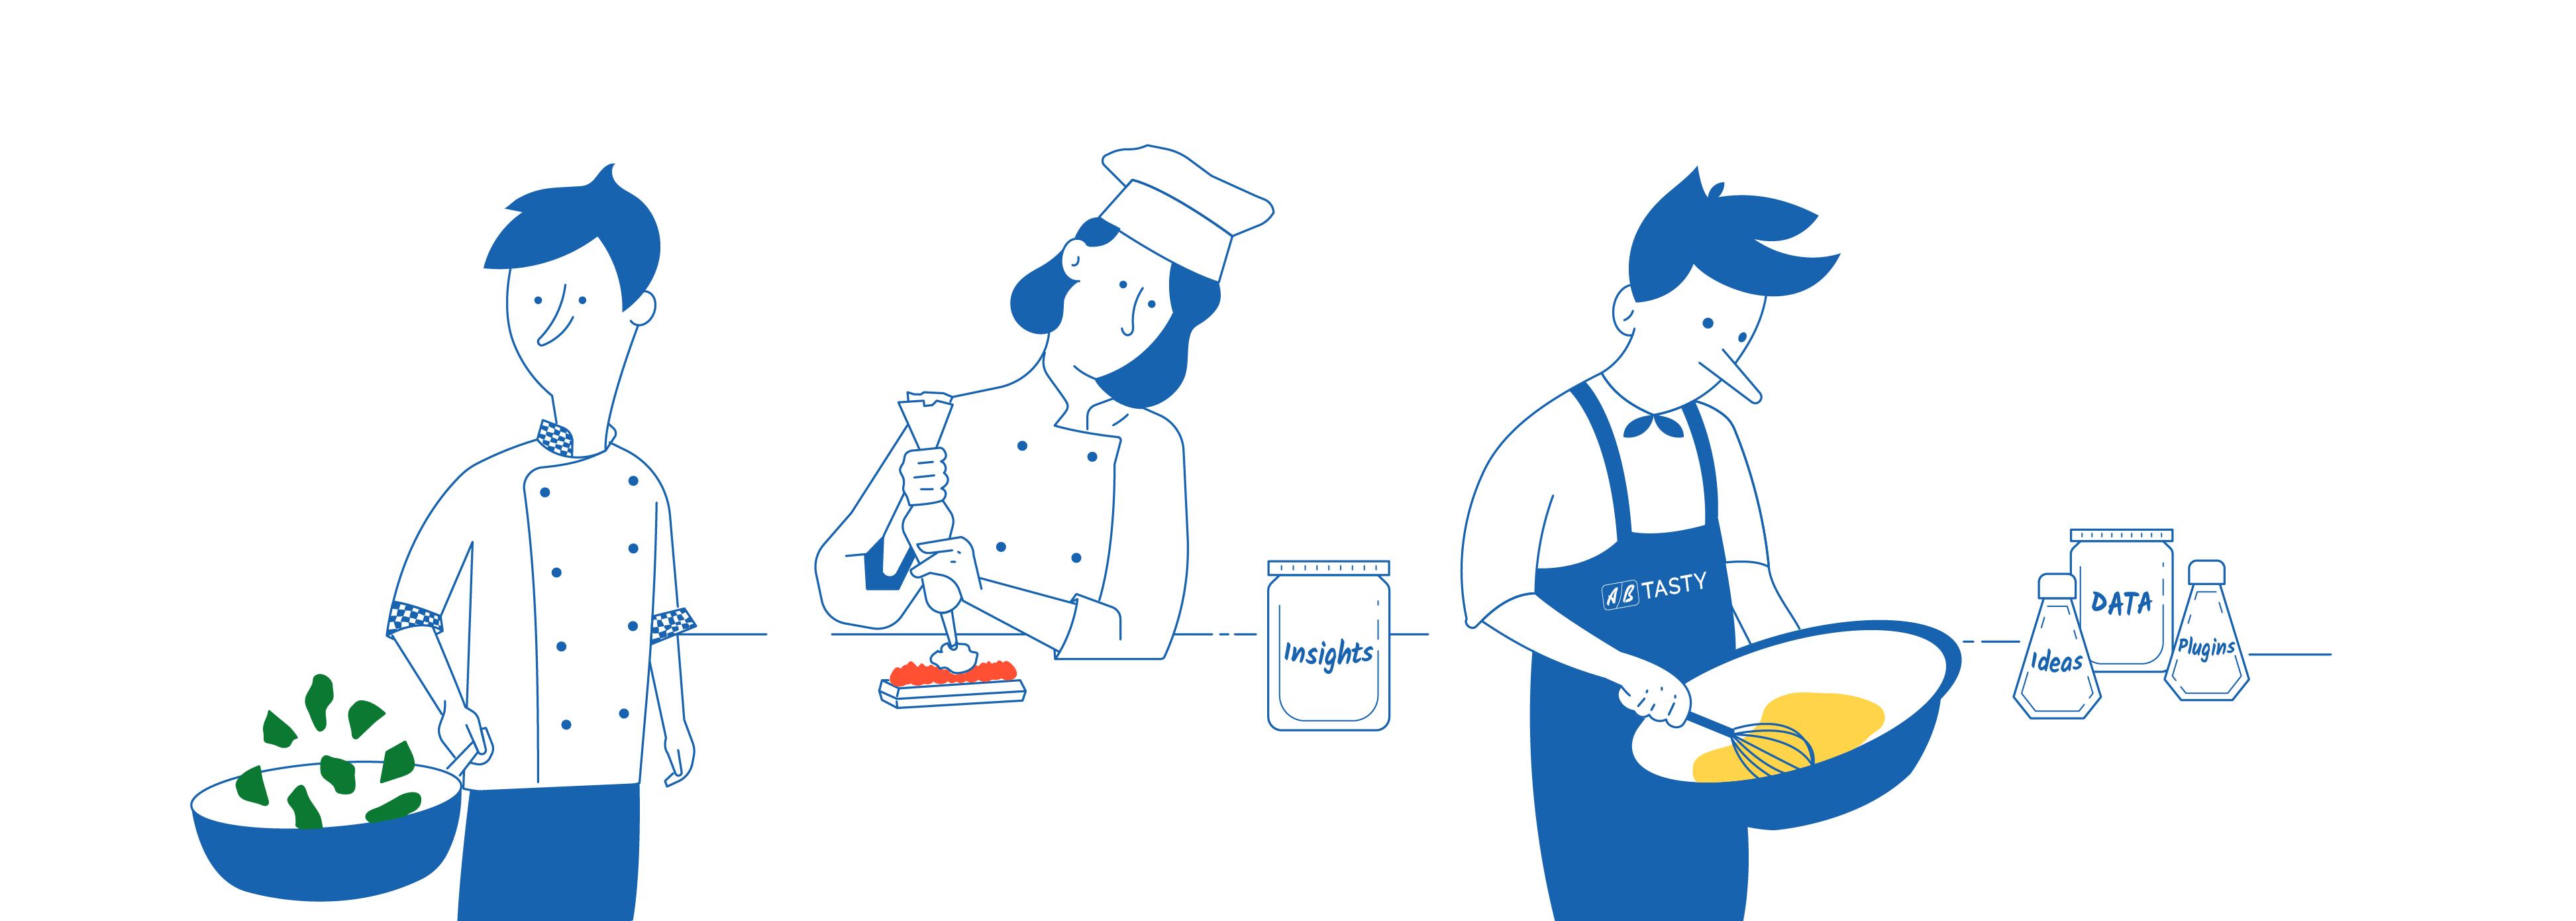 Illustration Blog Post-2